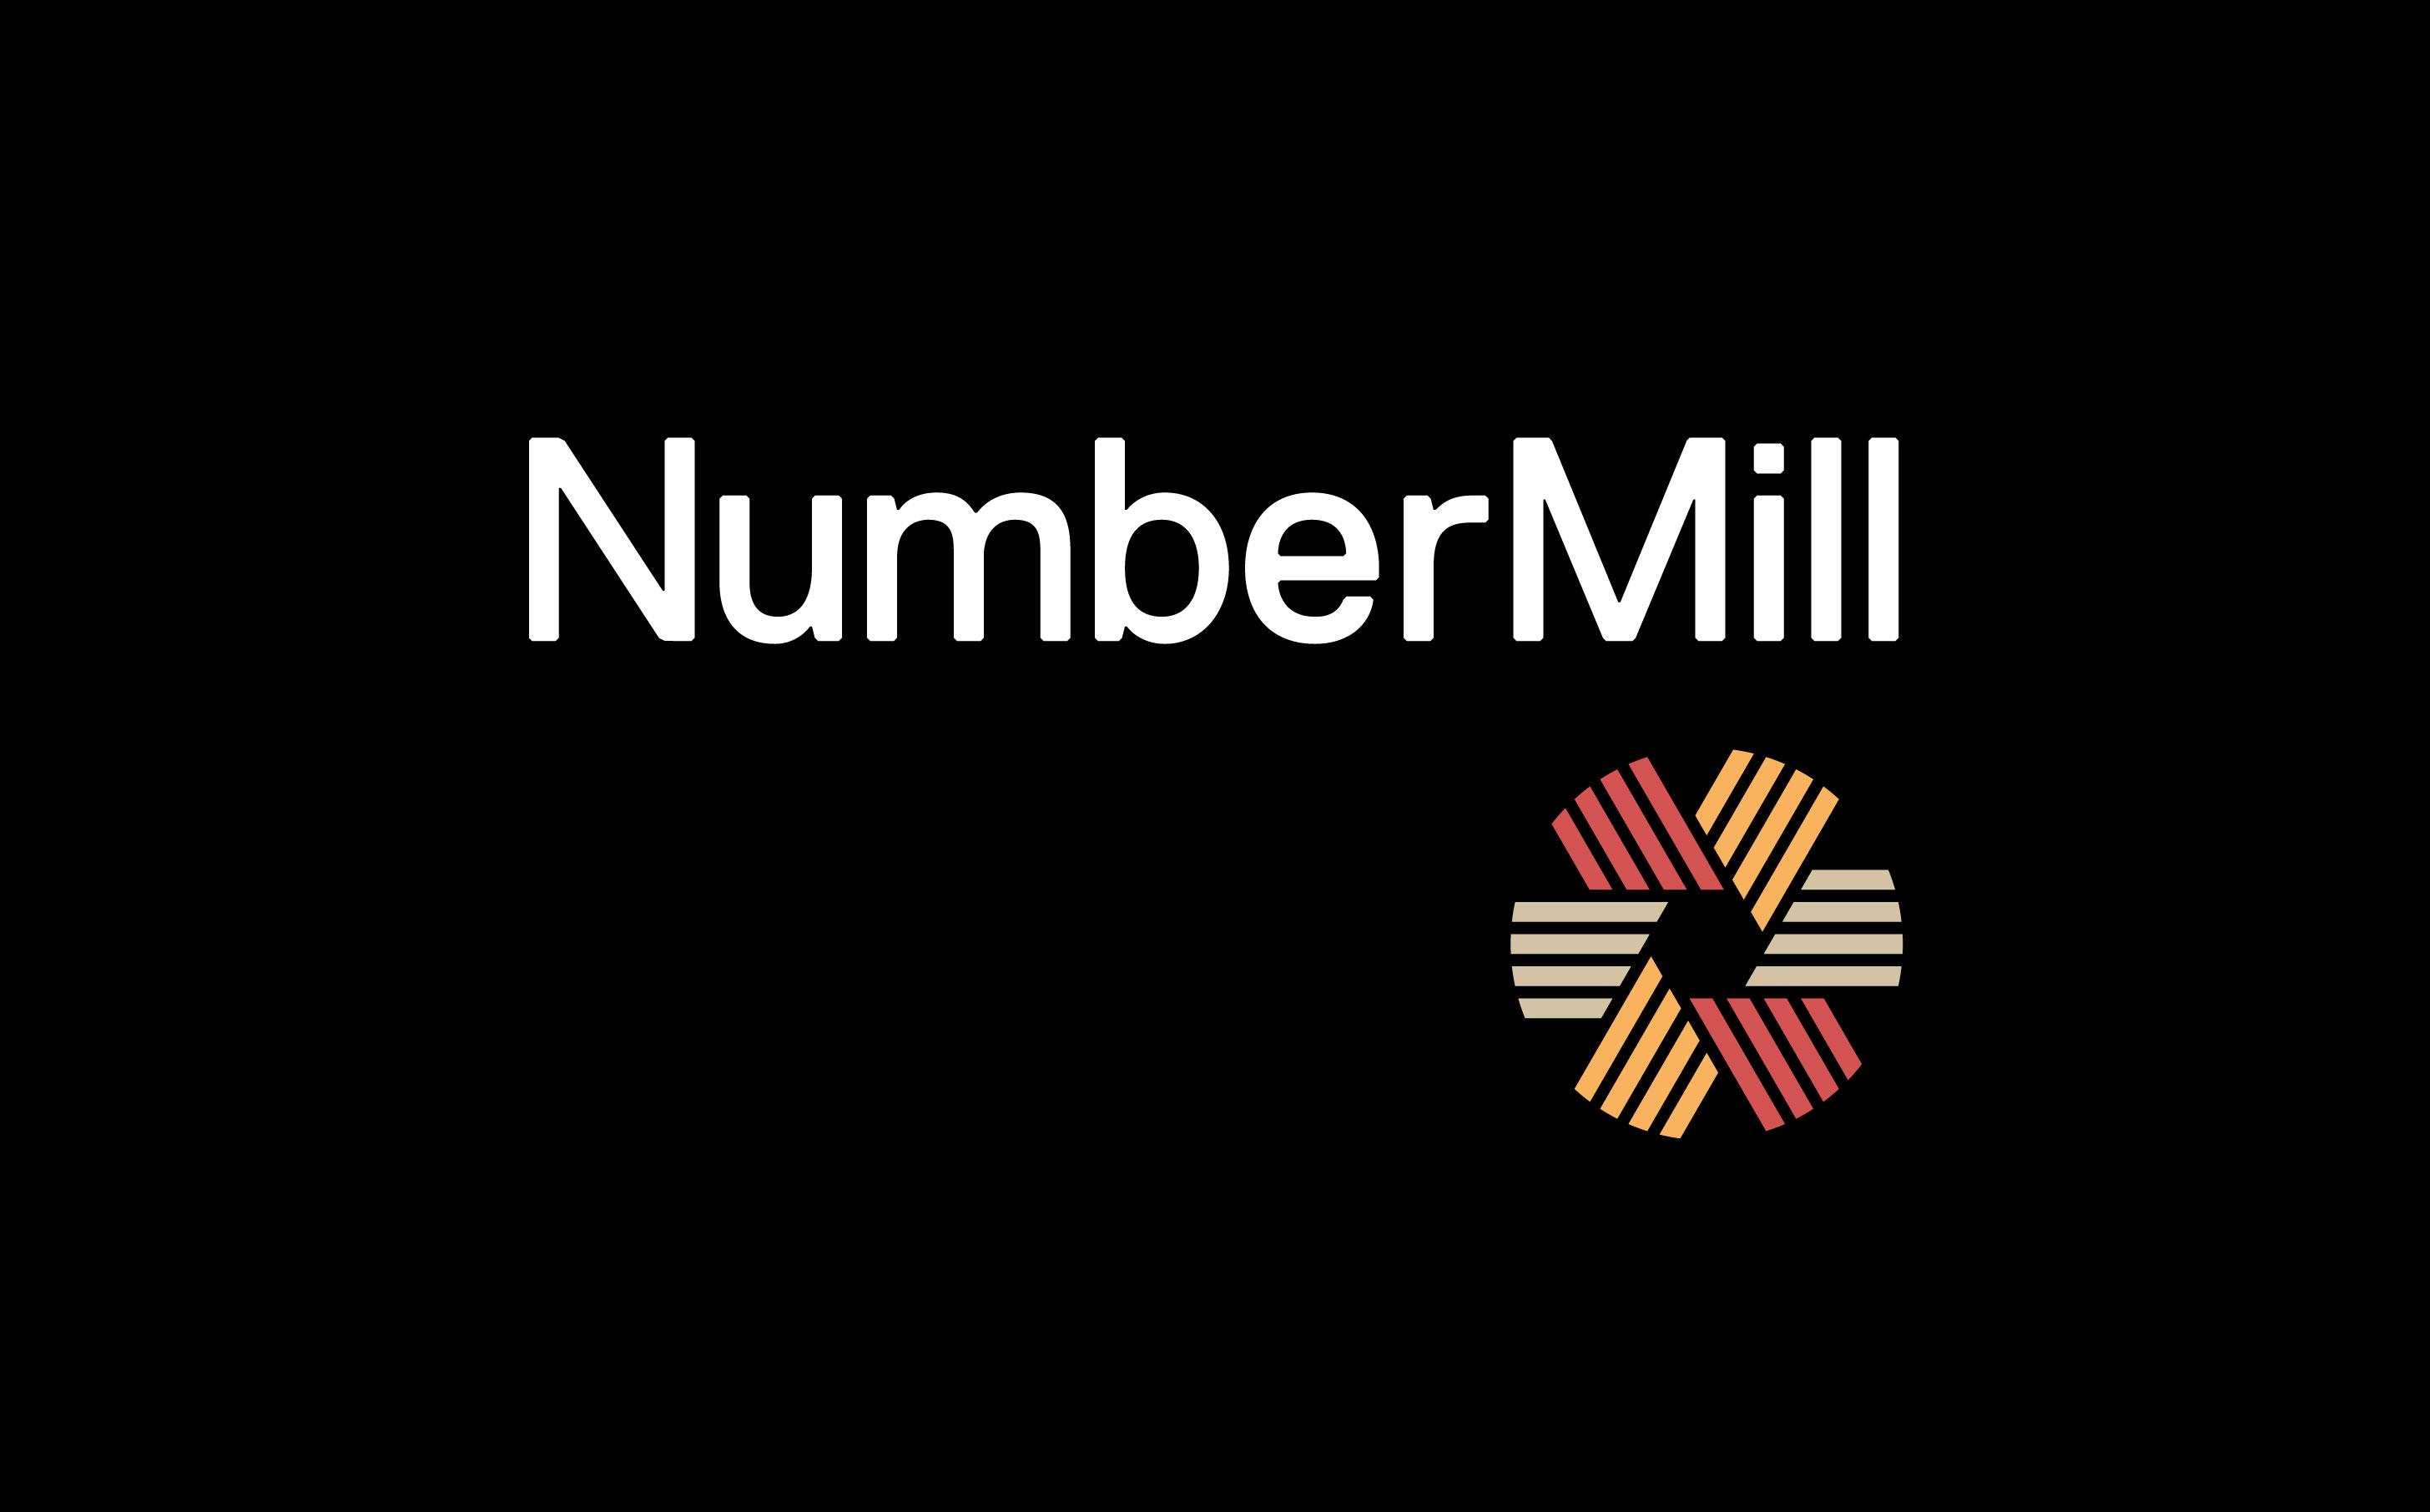 numbermill-logo-design-03